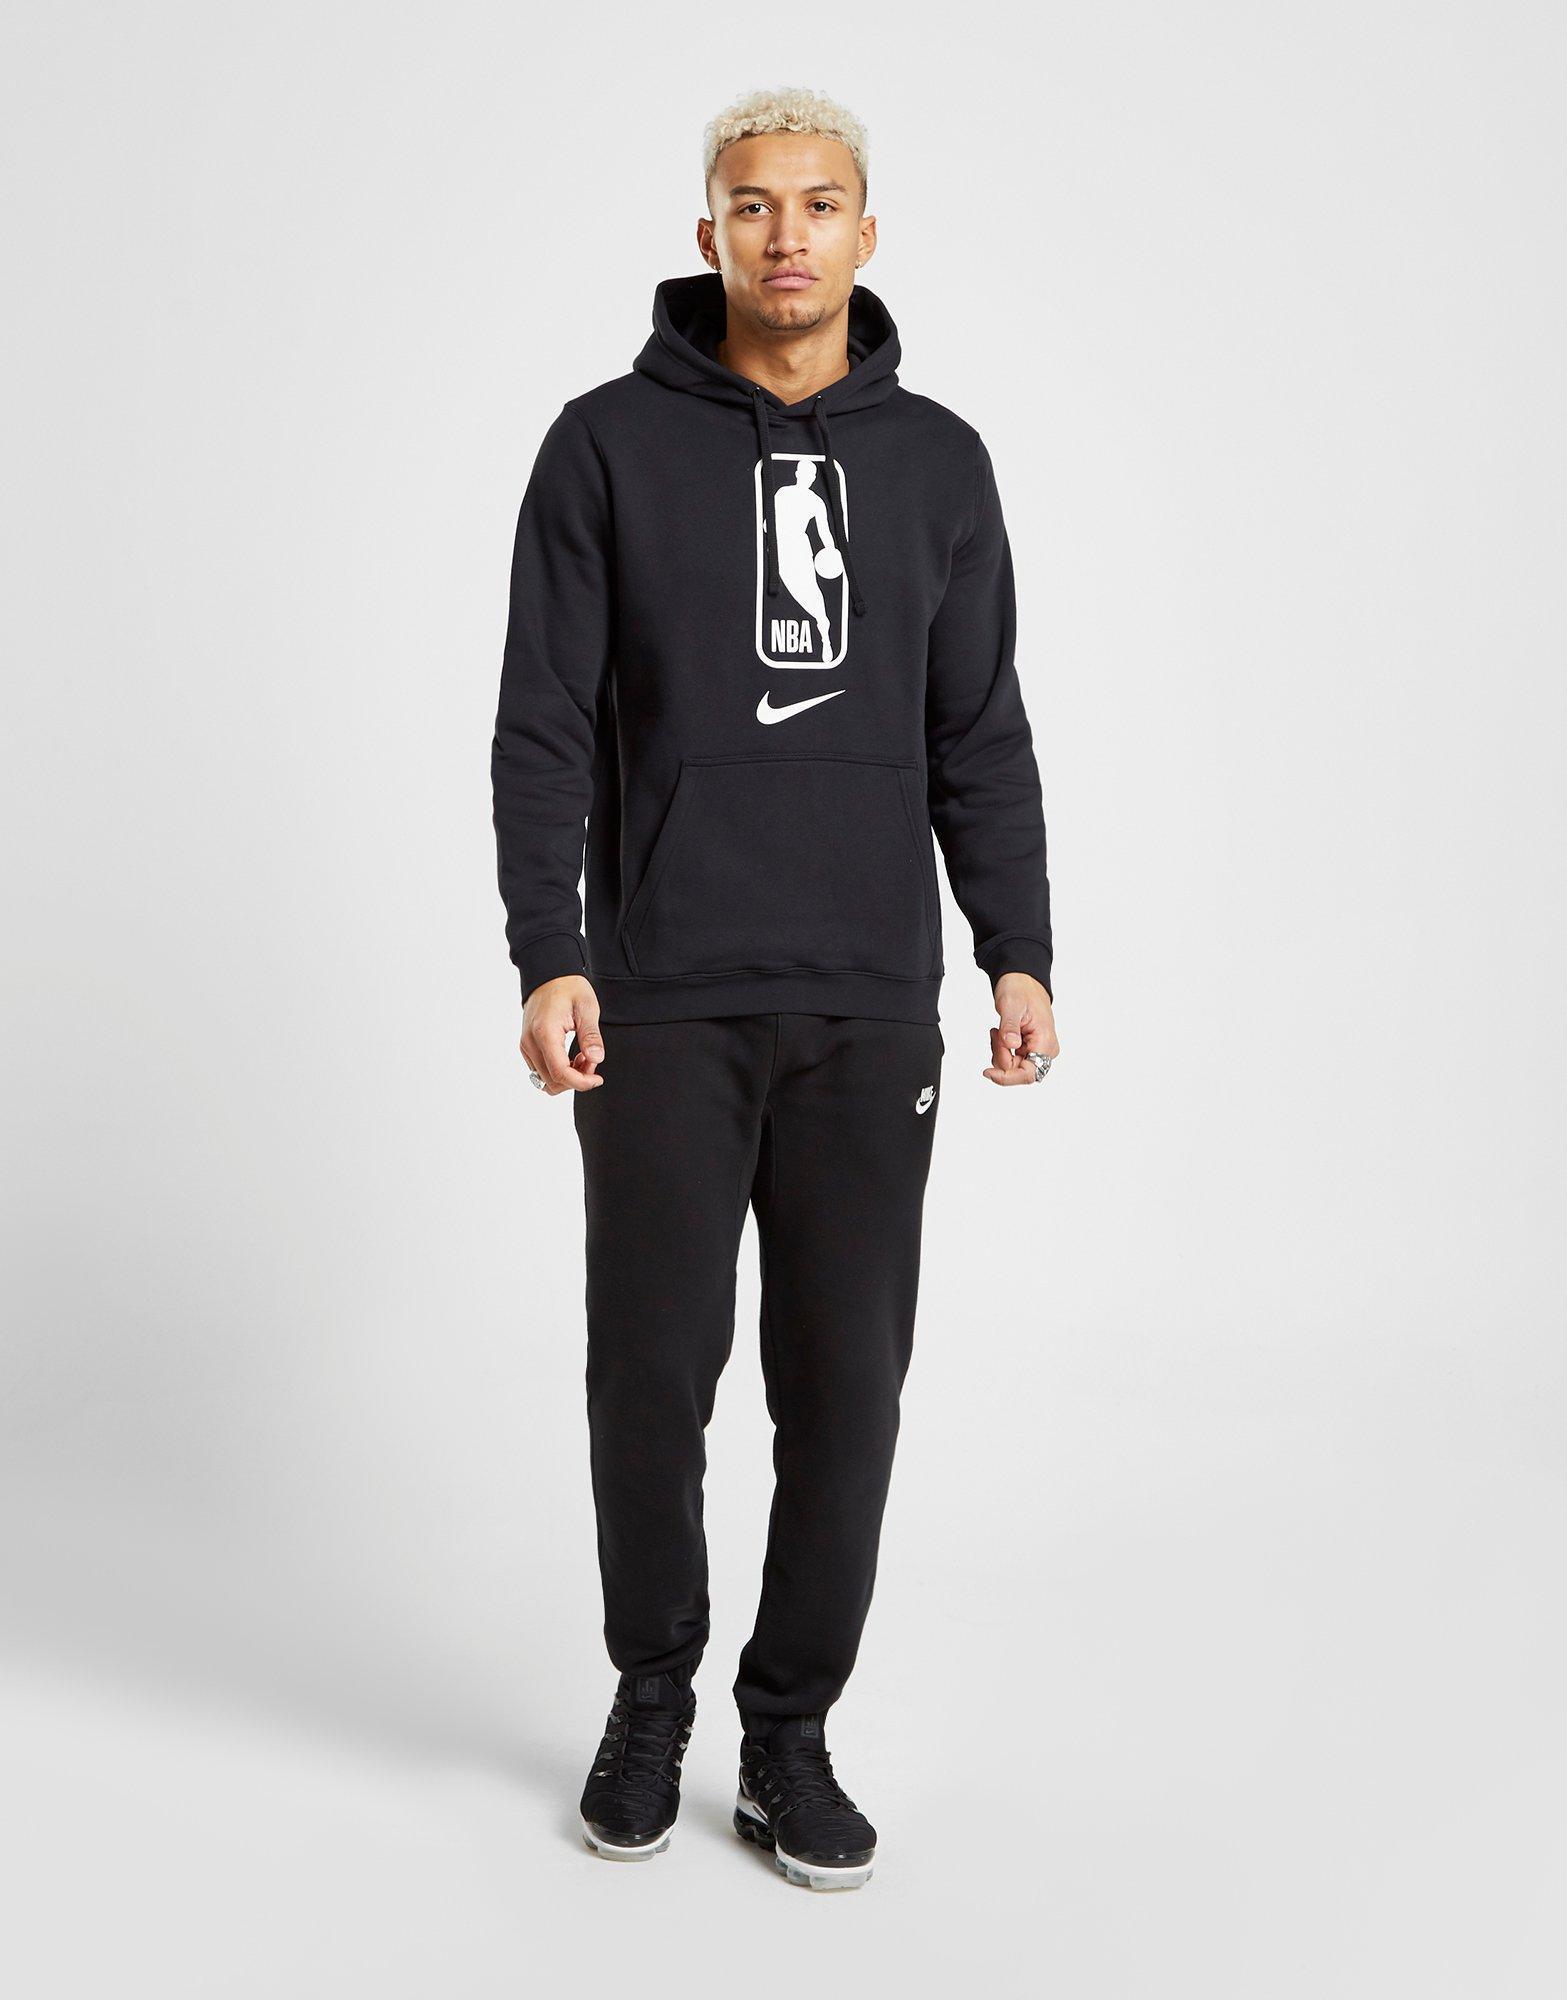 665a7b07 Nike Tech Fleece Nba